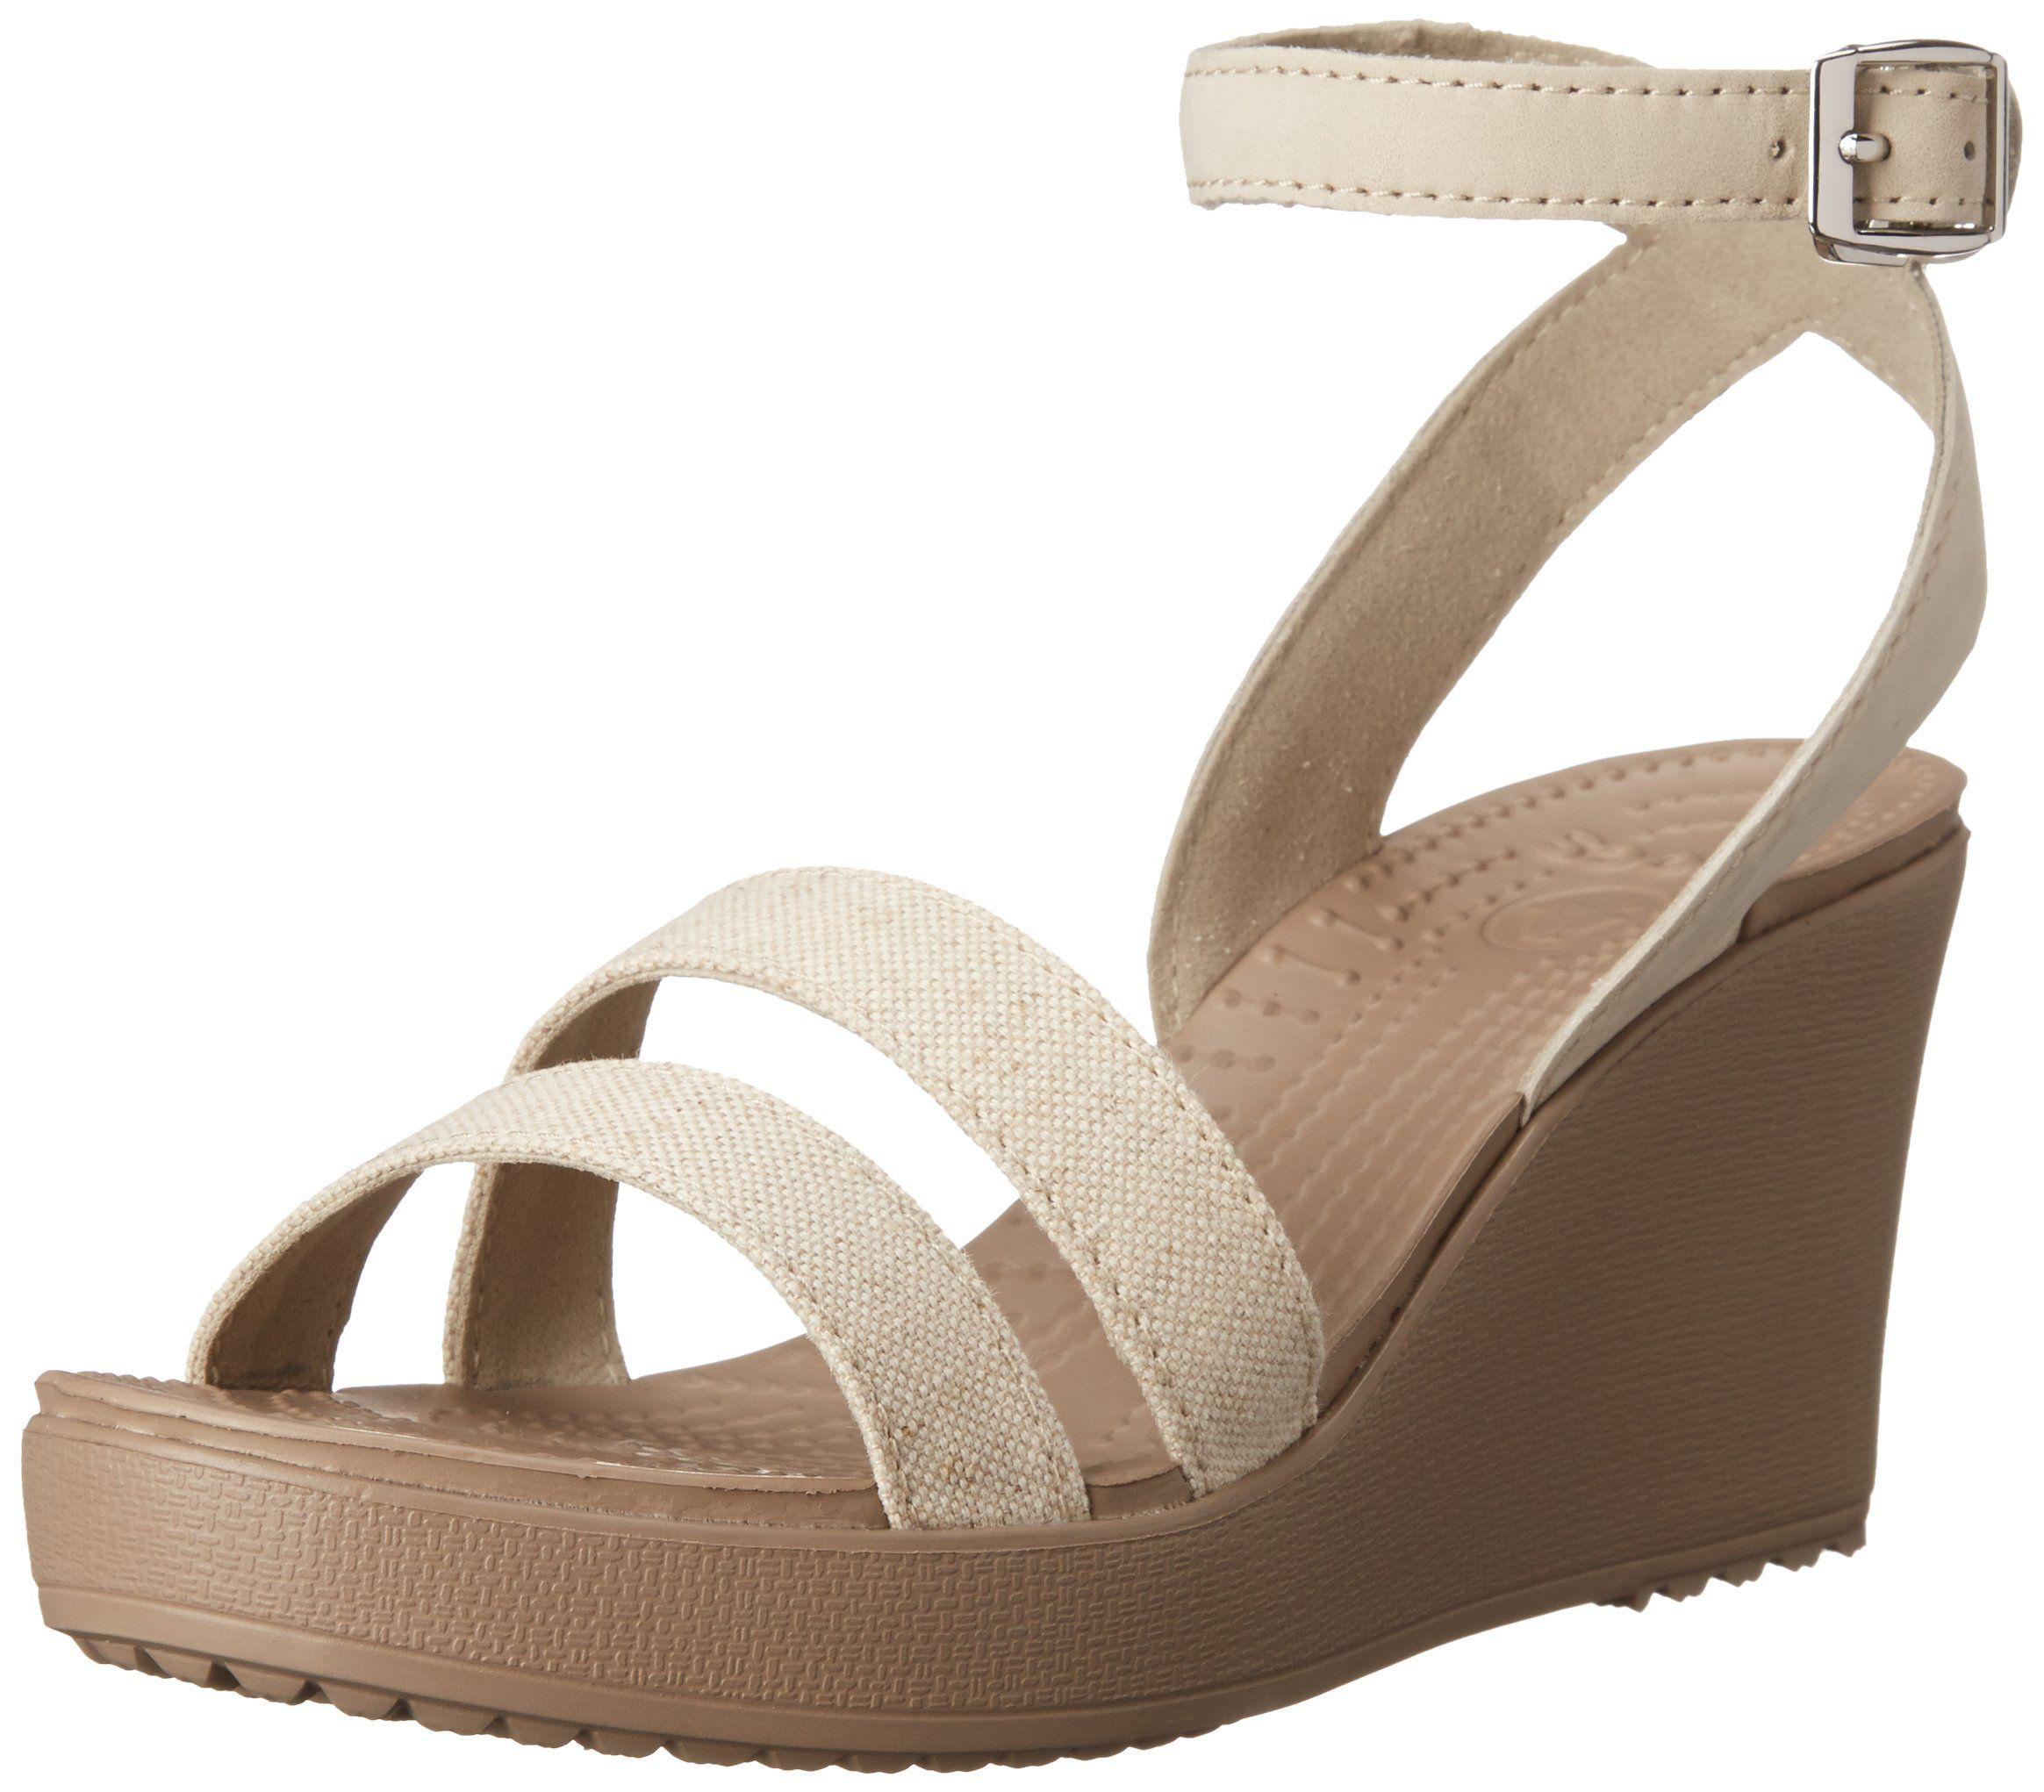 b5dcbc97 Amazon.com: crocs Women's Leigh Wedge: Shoes | Vacation Shopping ...